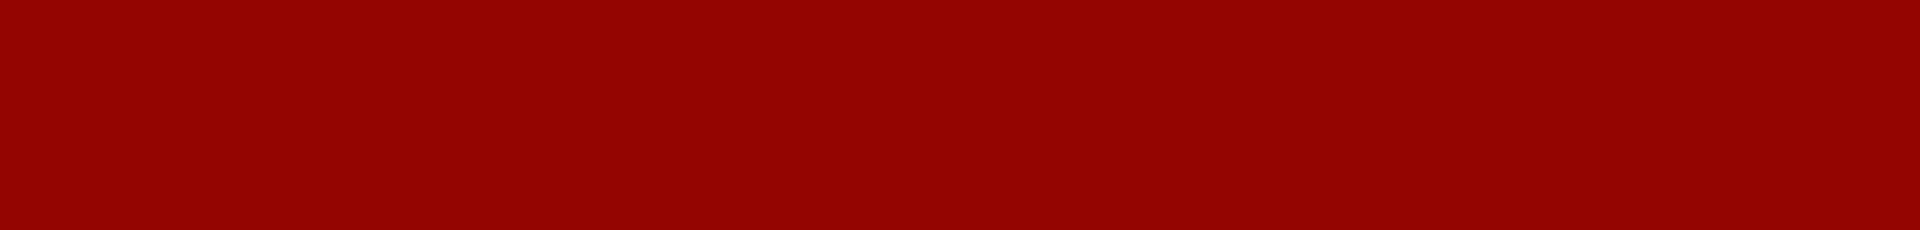 footer red long.jpg